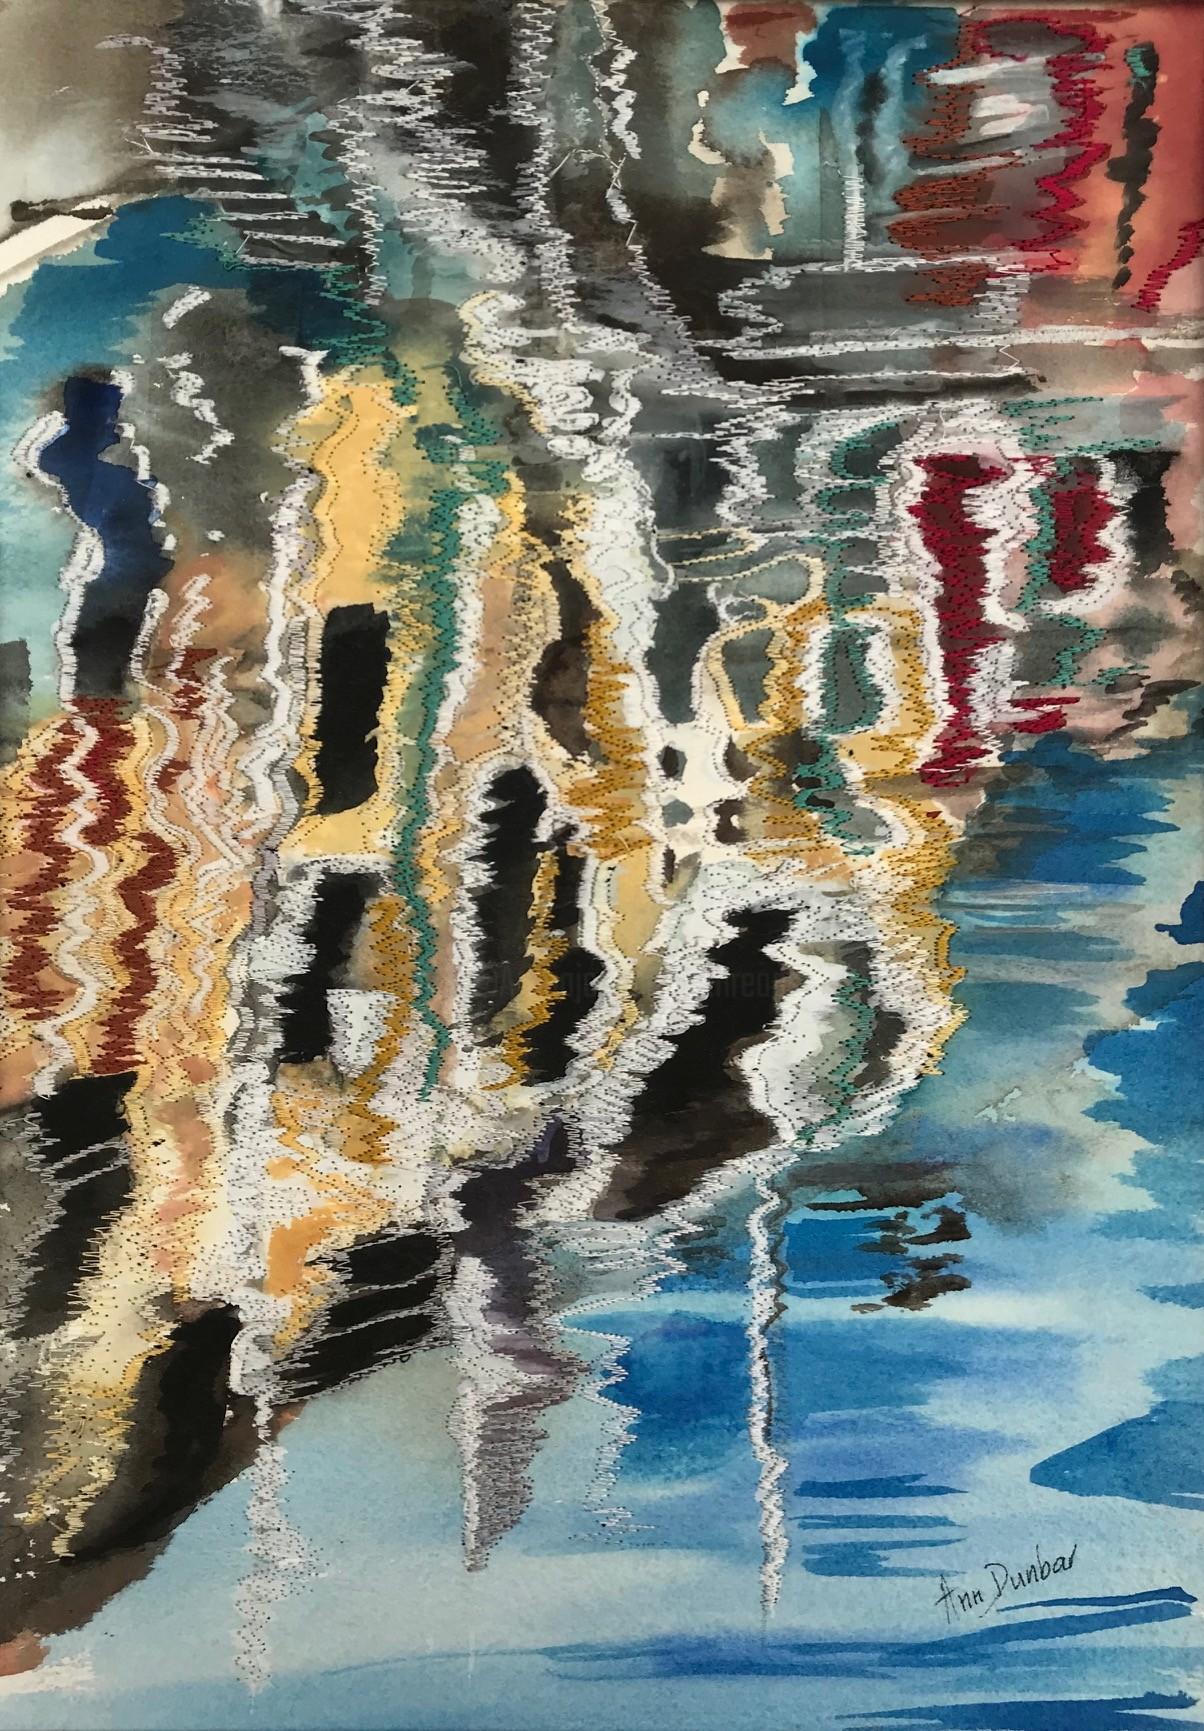 Ann Dunbar - Reflection 4